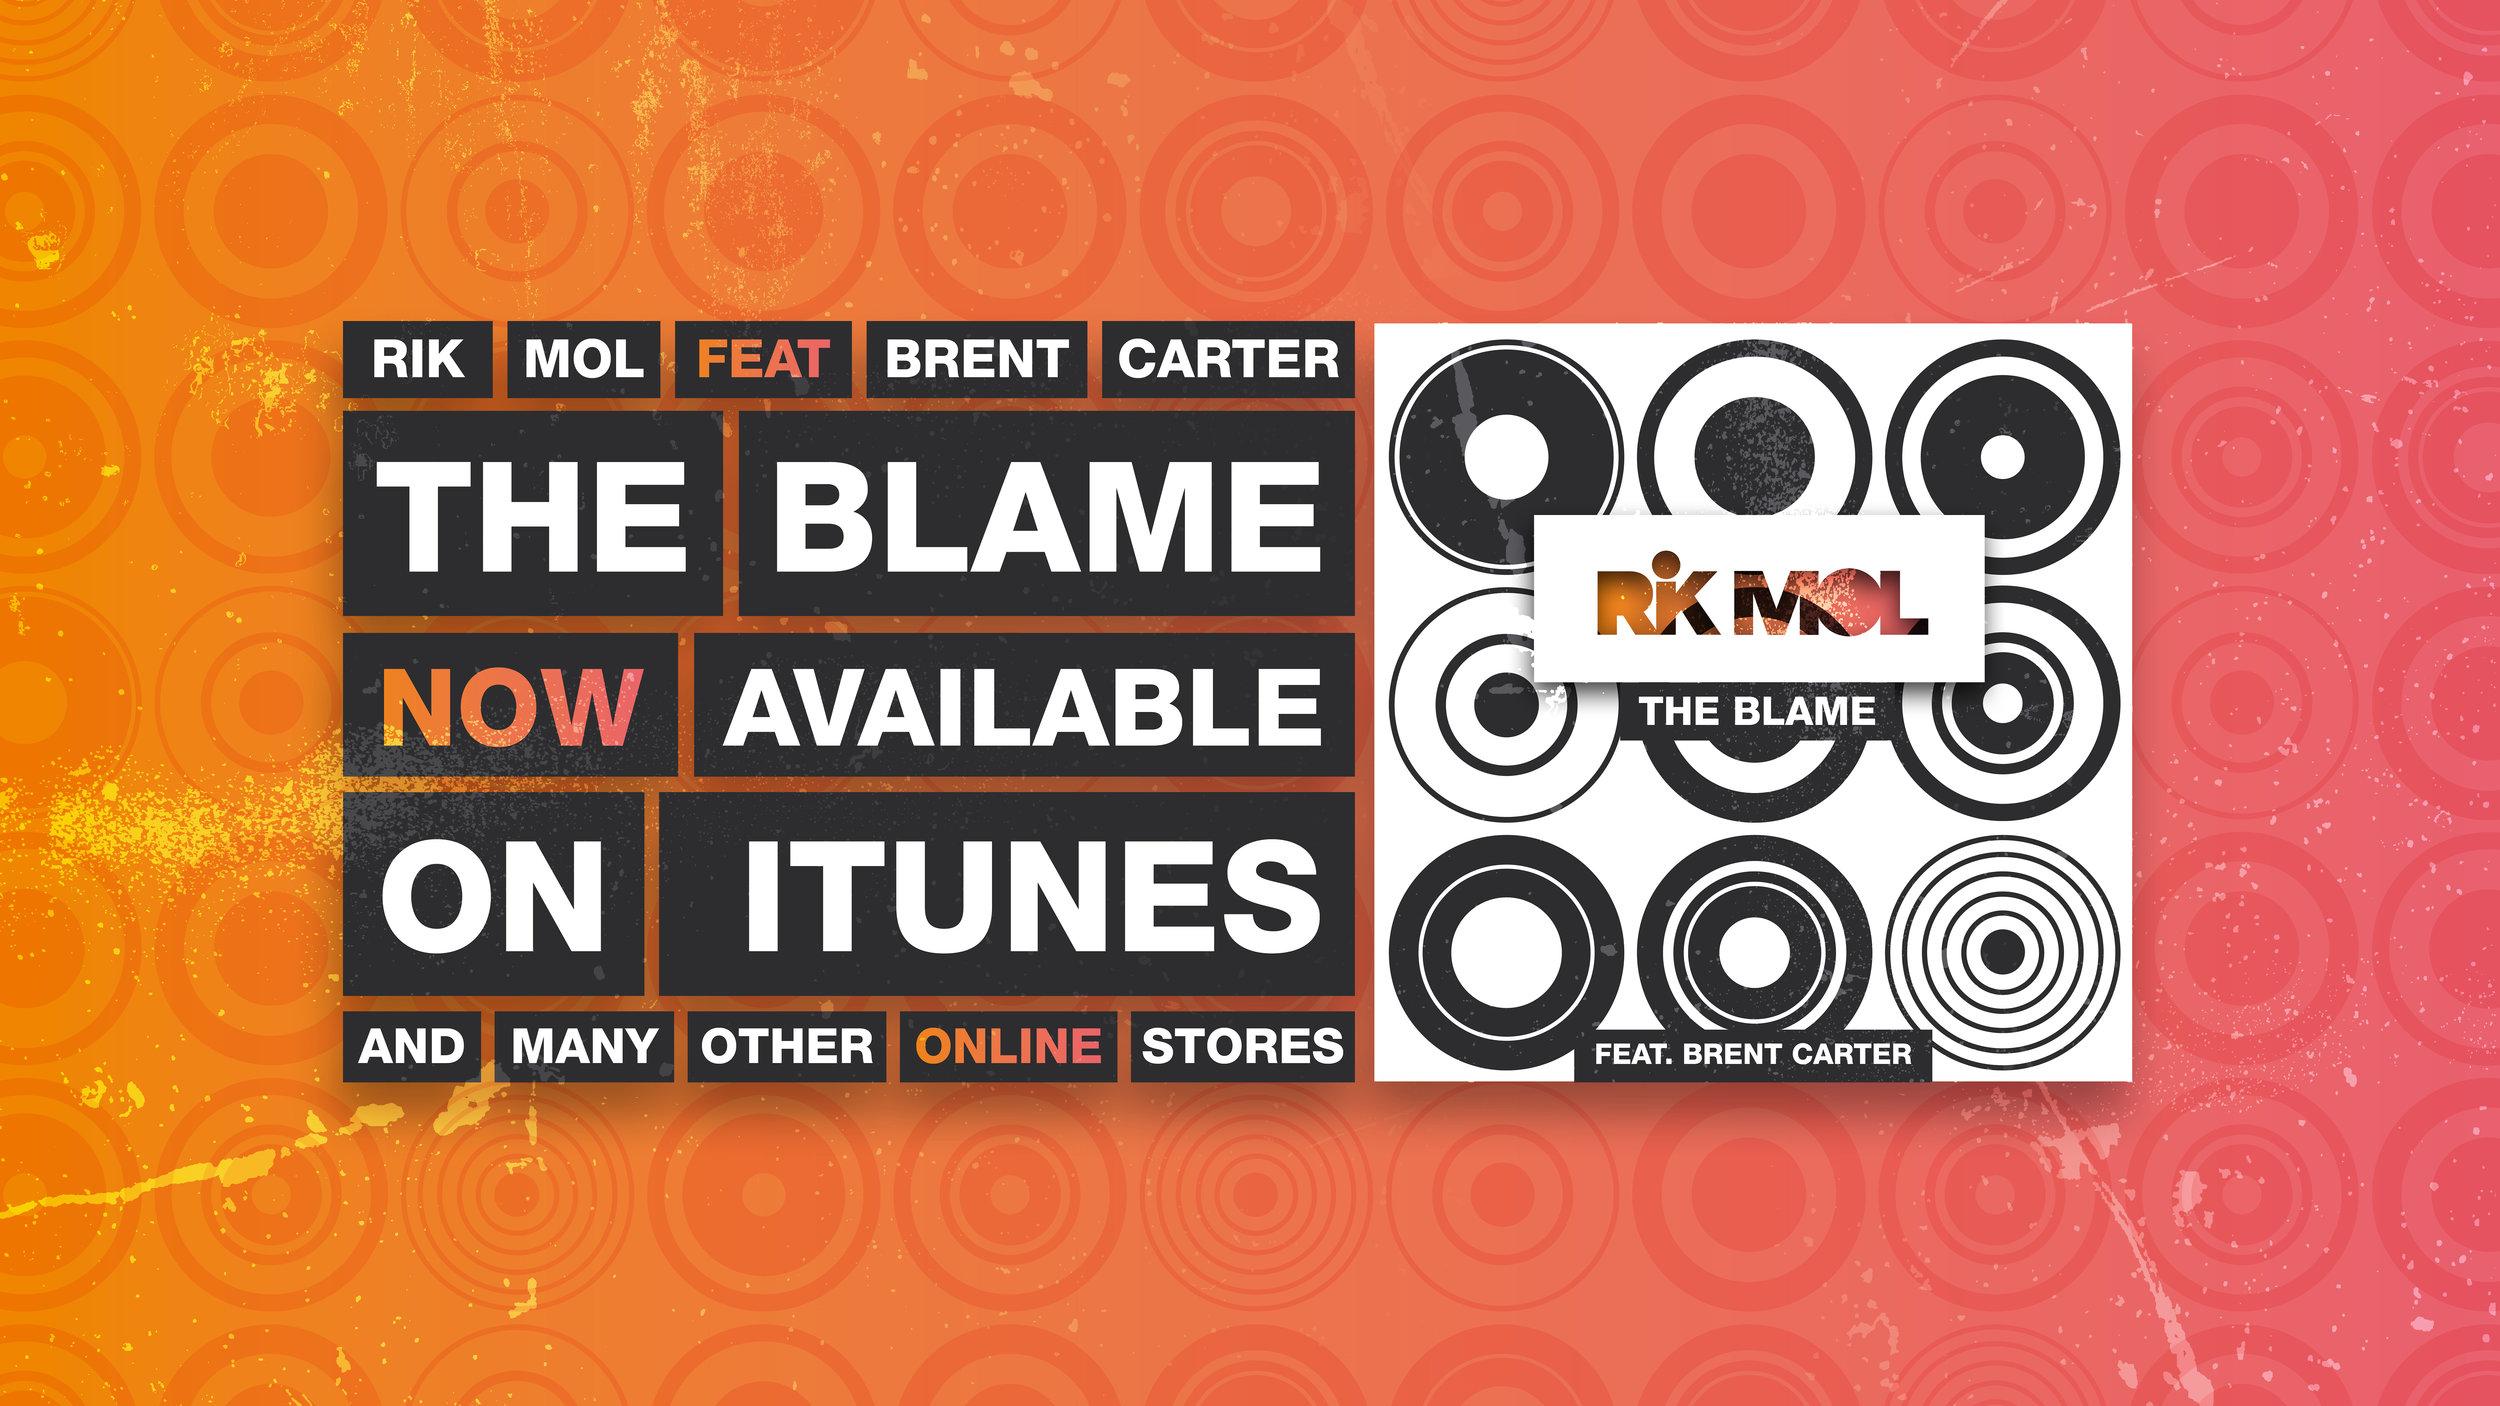 Rik Mol-The Blame banner hires.jpg